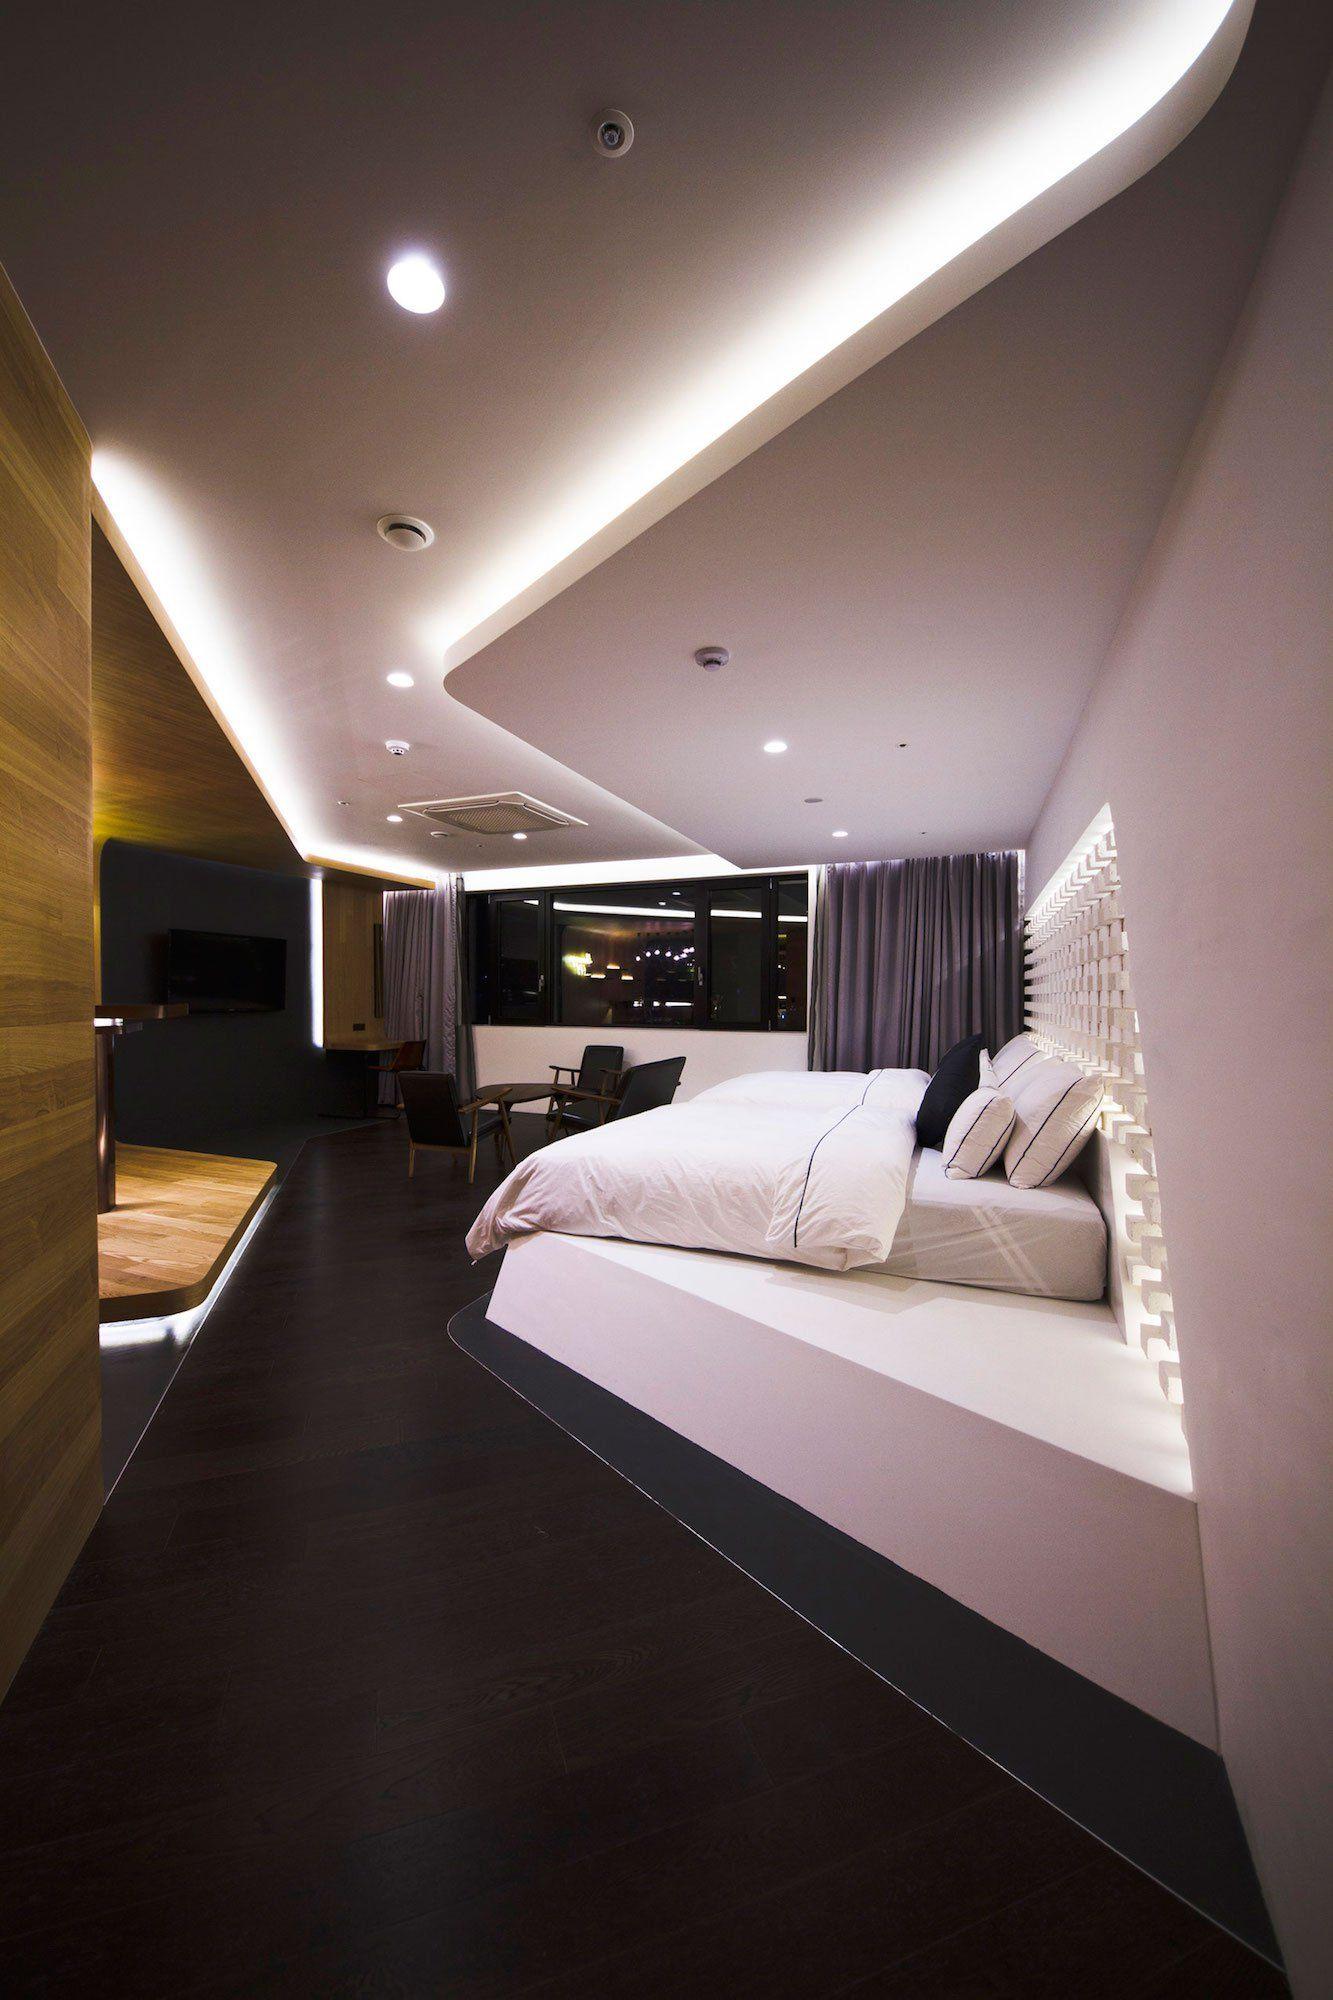 Home interior ceiling design lounge  háló  pinterest  bedroom interior and lounge